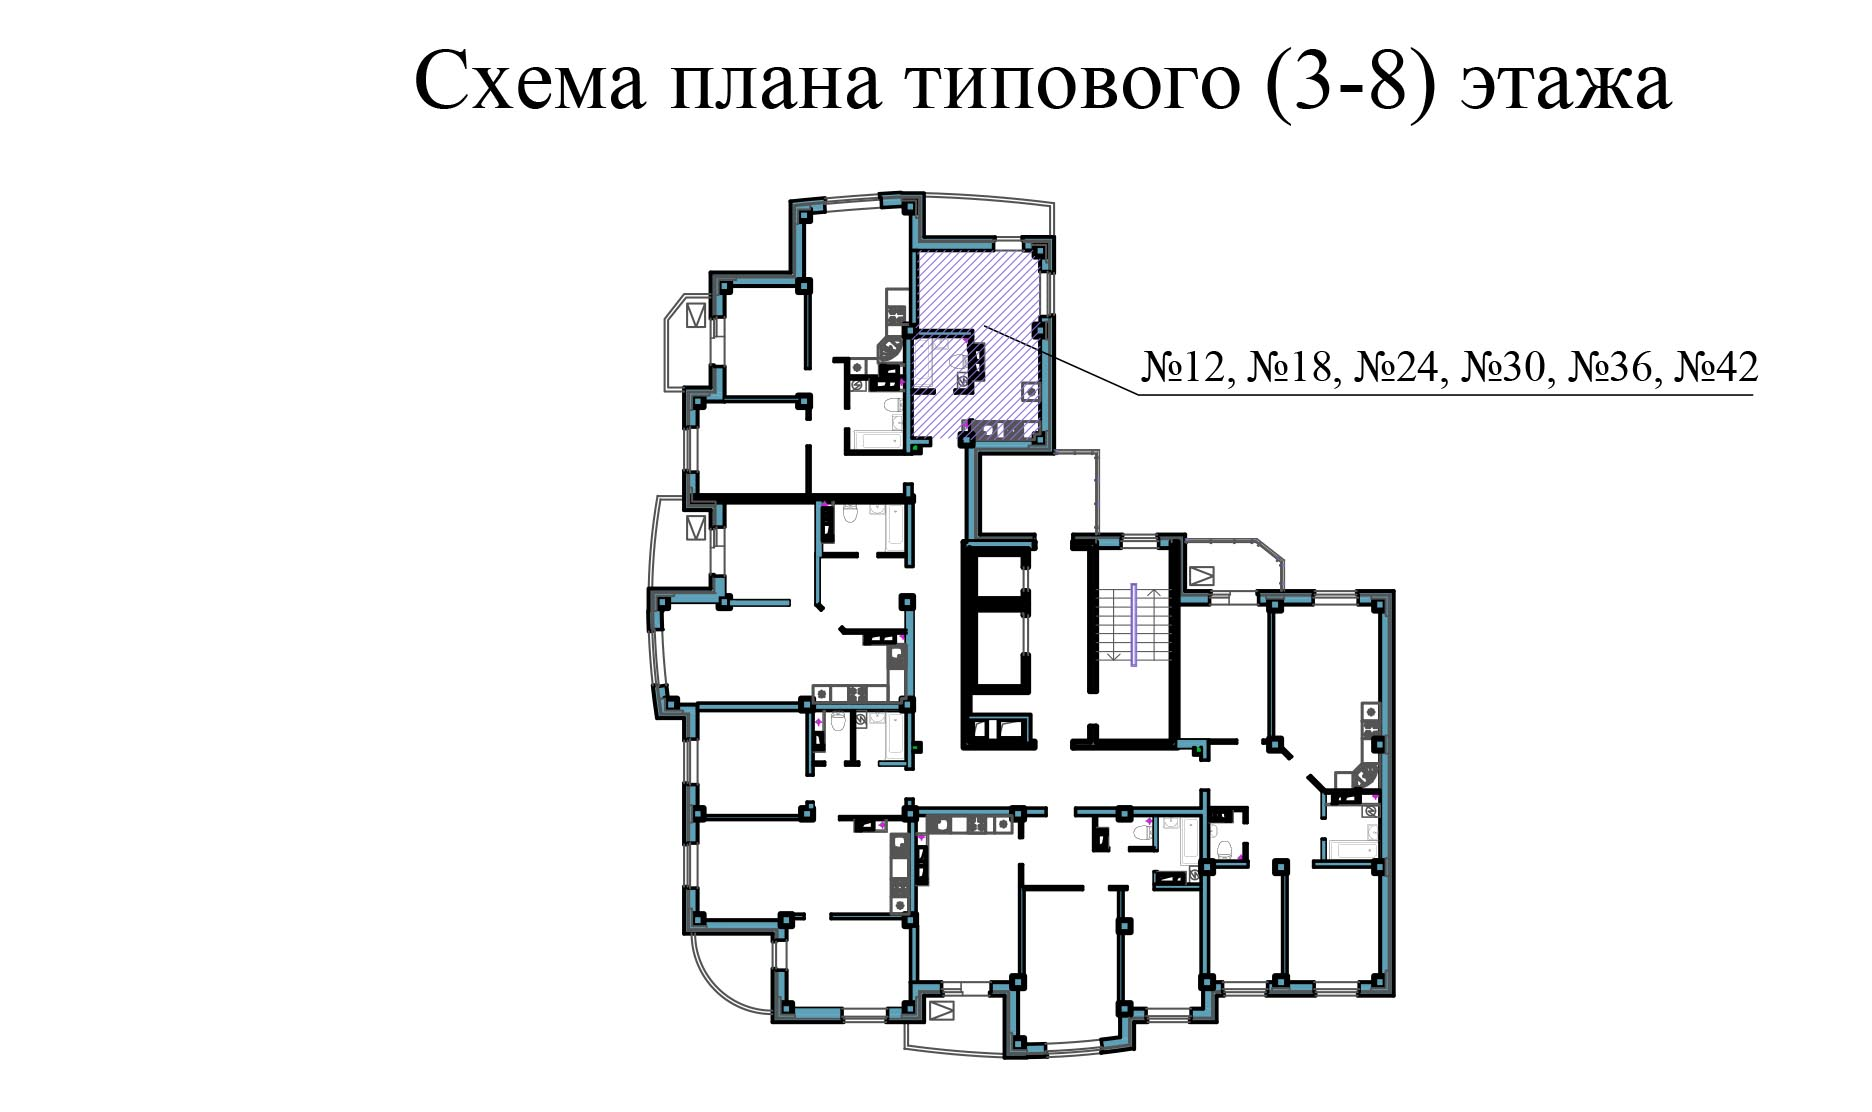 Студия - ул.Балтийская, д. 1а, кв. 12, 18, 24, 30, 36, 42